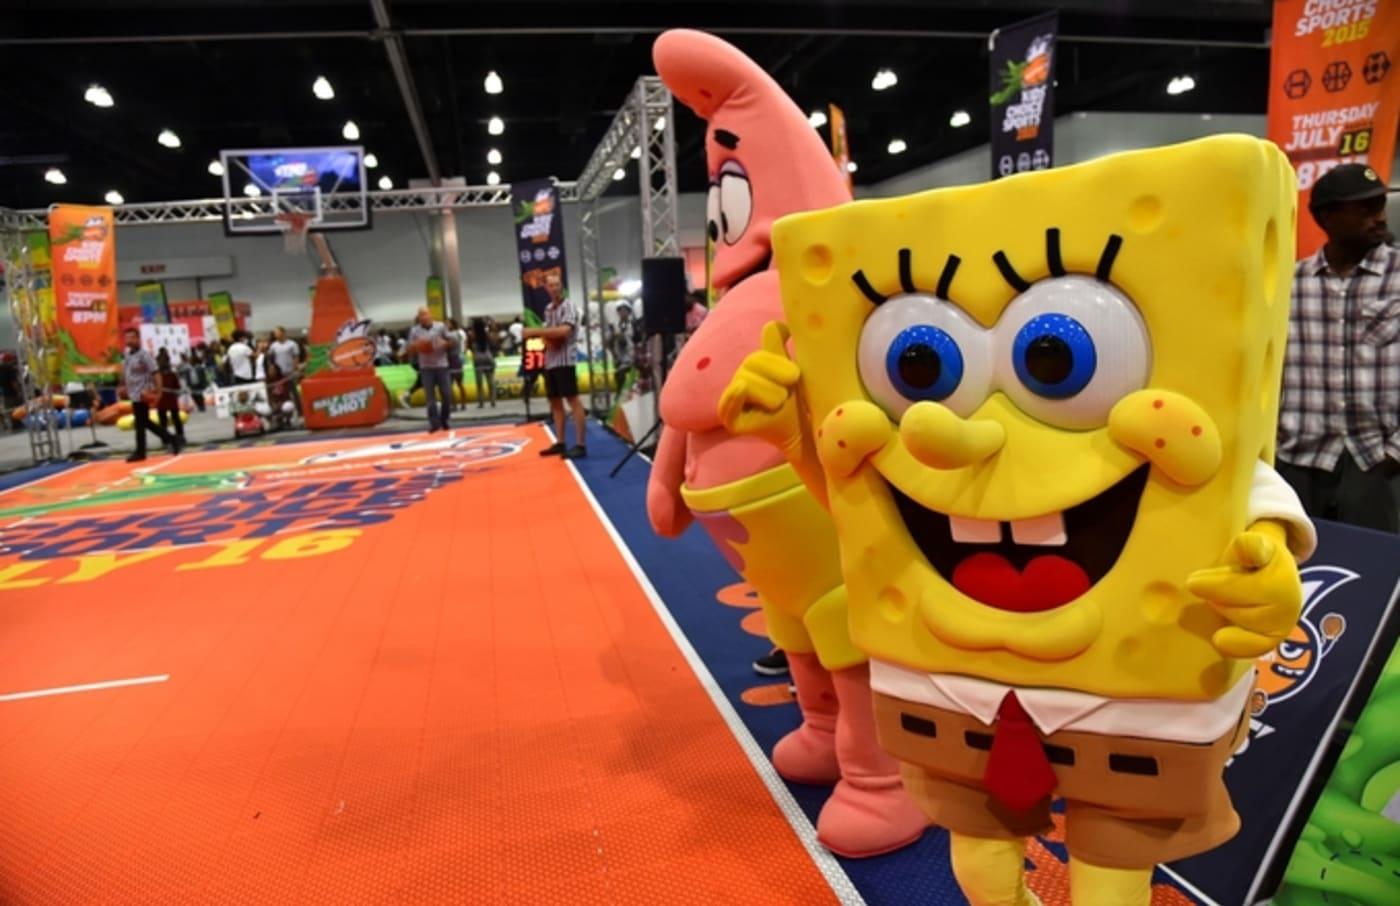 spongebob patrick basketball